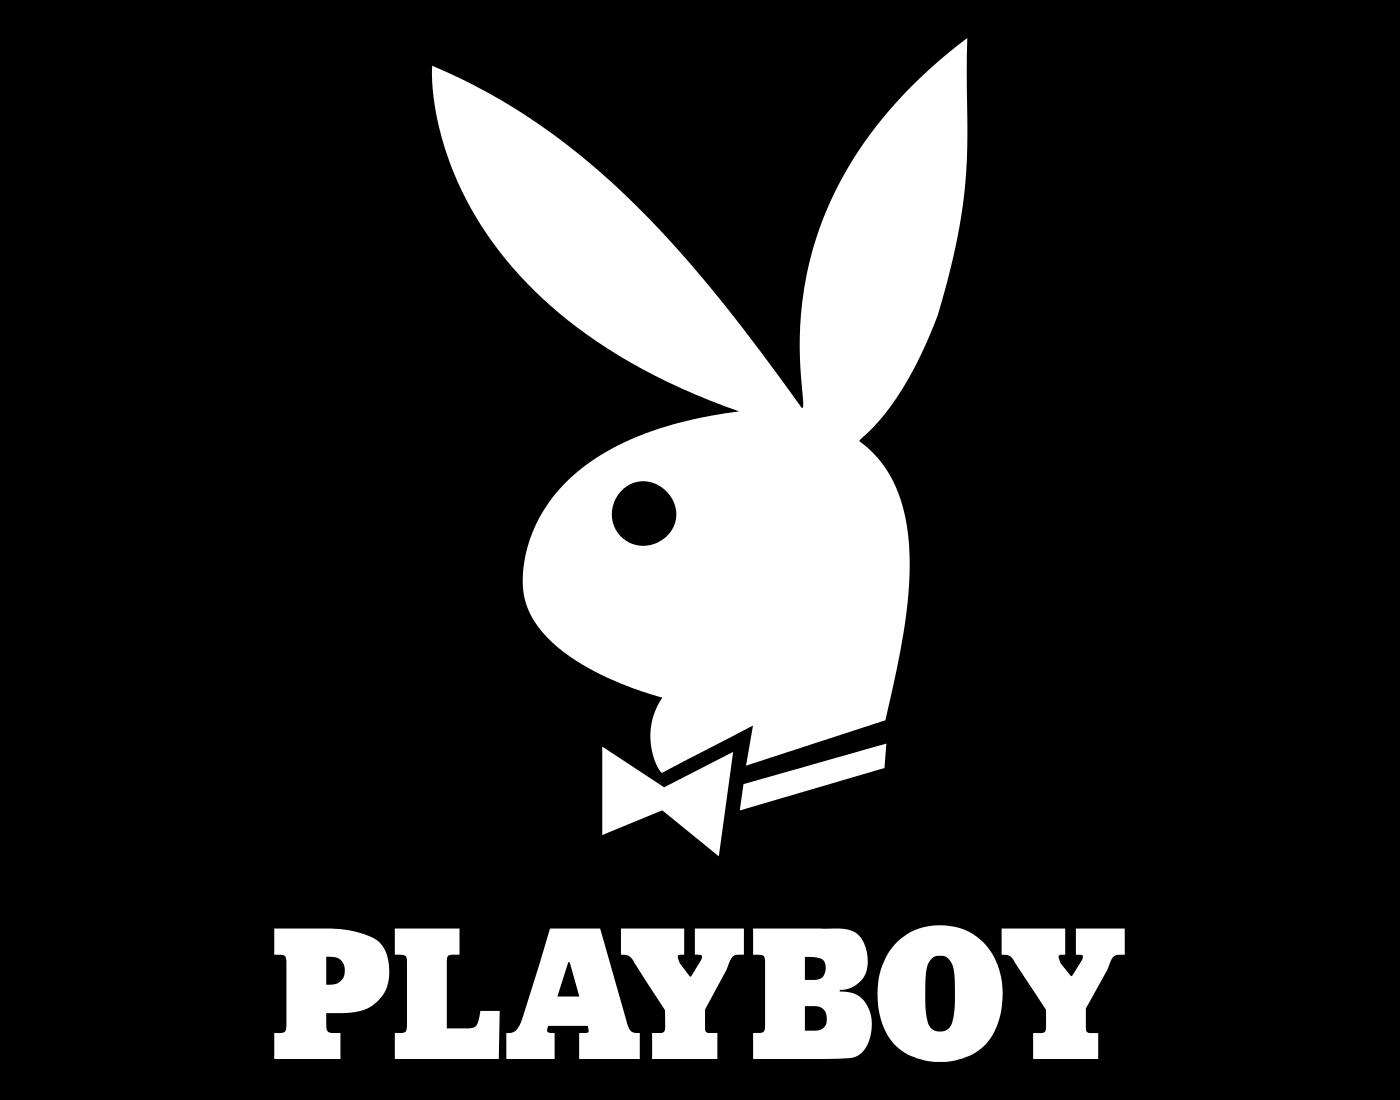 Playboy rinde homenaje a Hugh Hefner